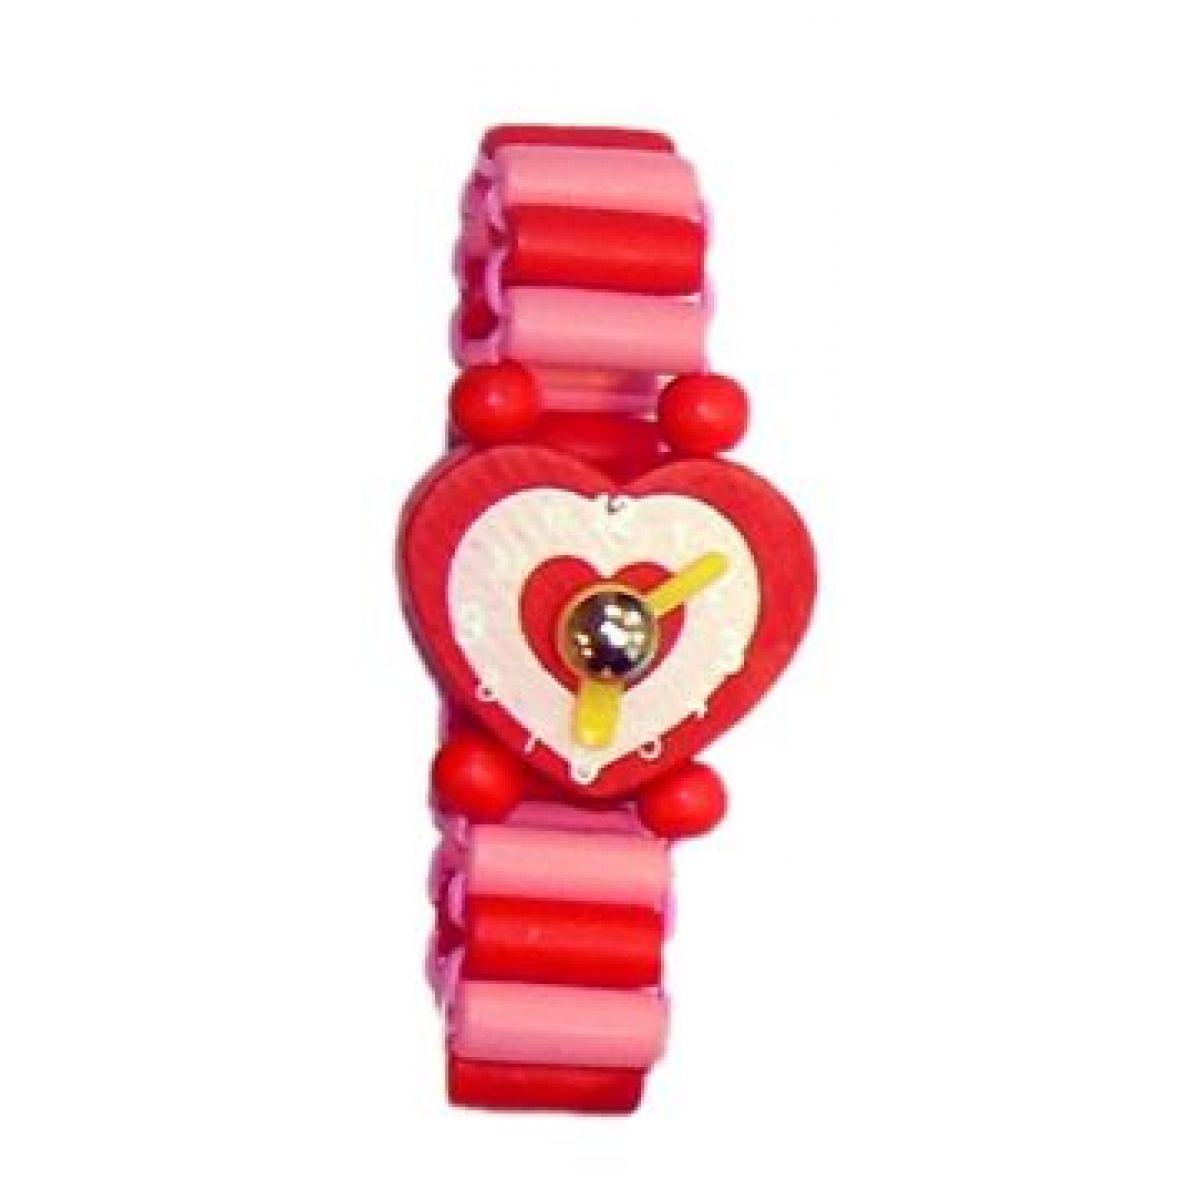 Dřevěné náramkové hodinky - Růžovo-červená